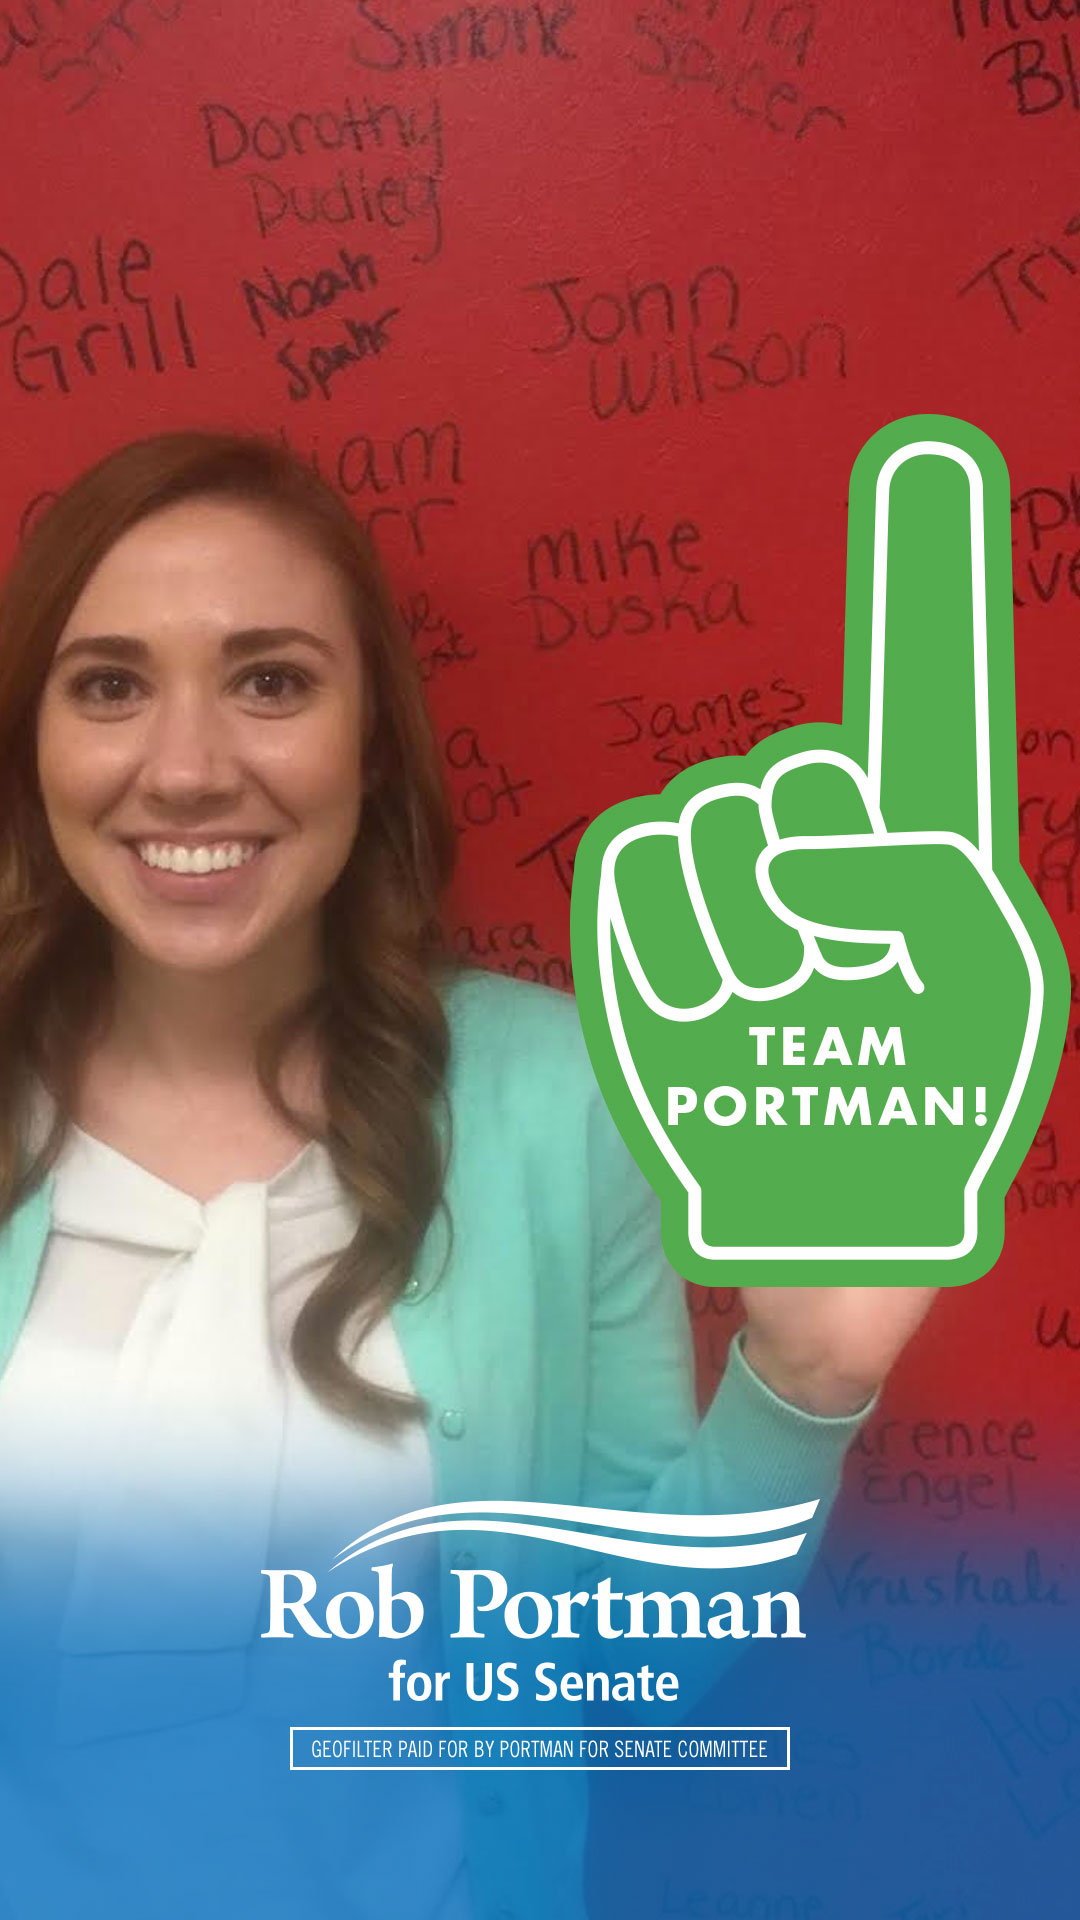 Team Portman!